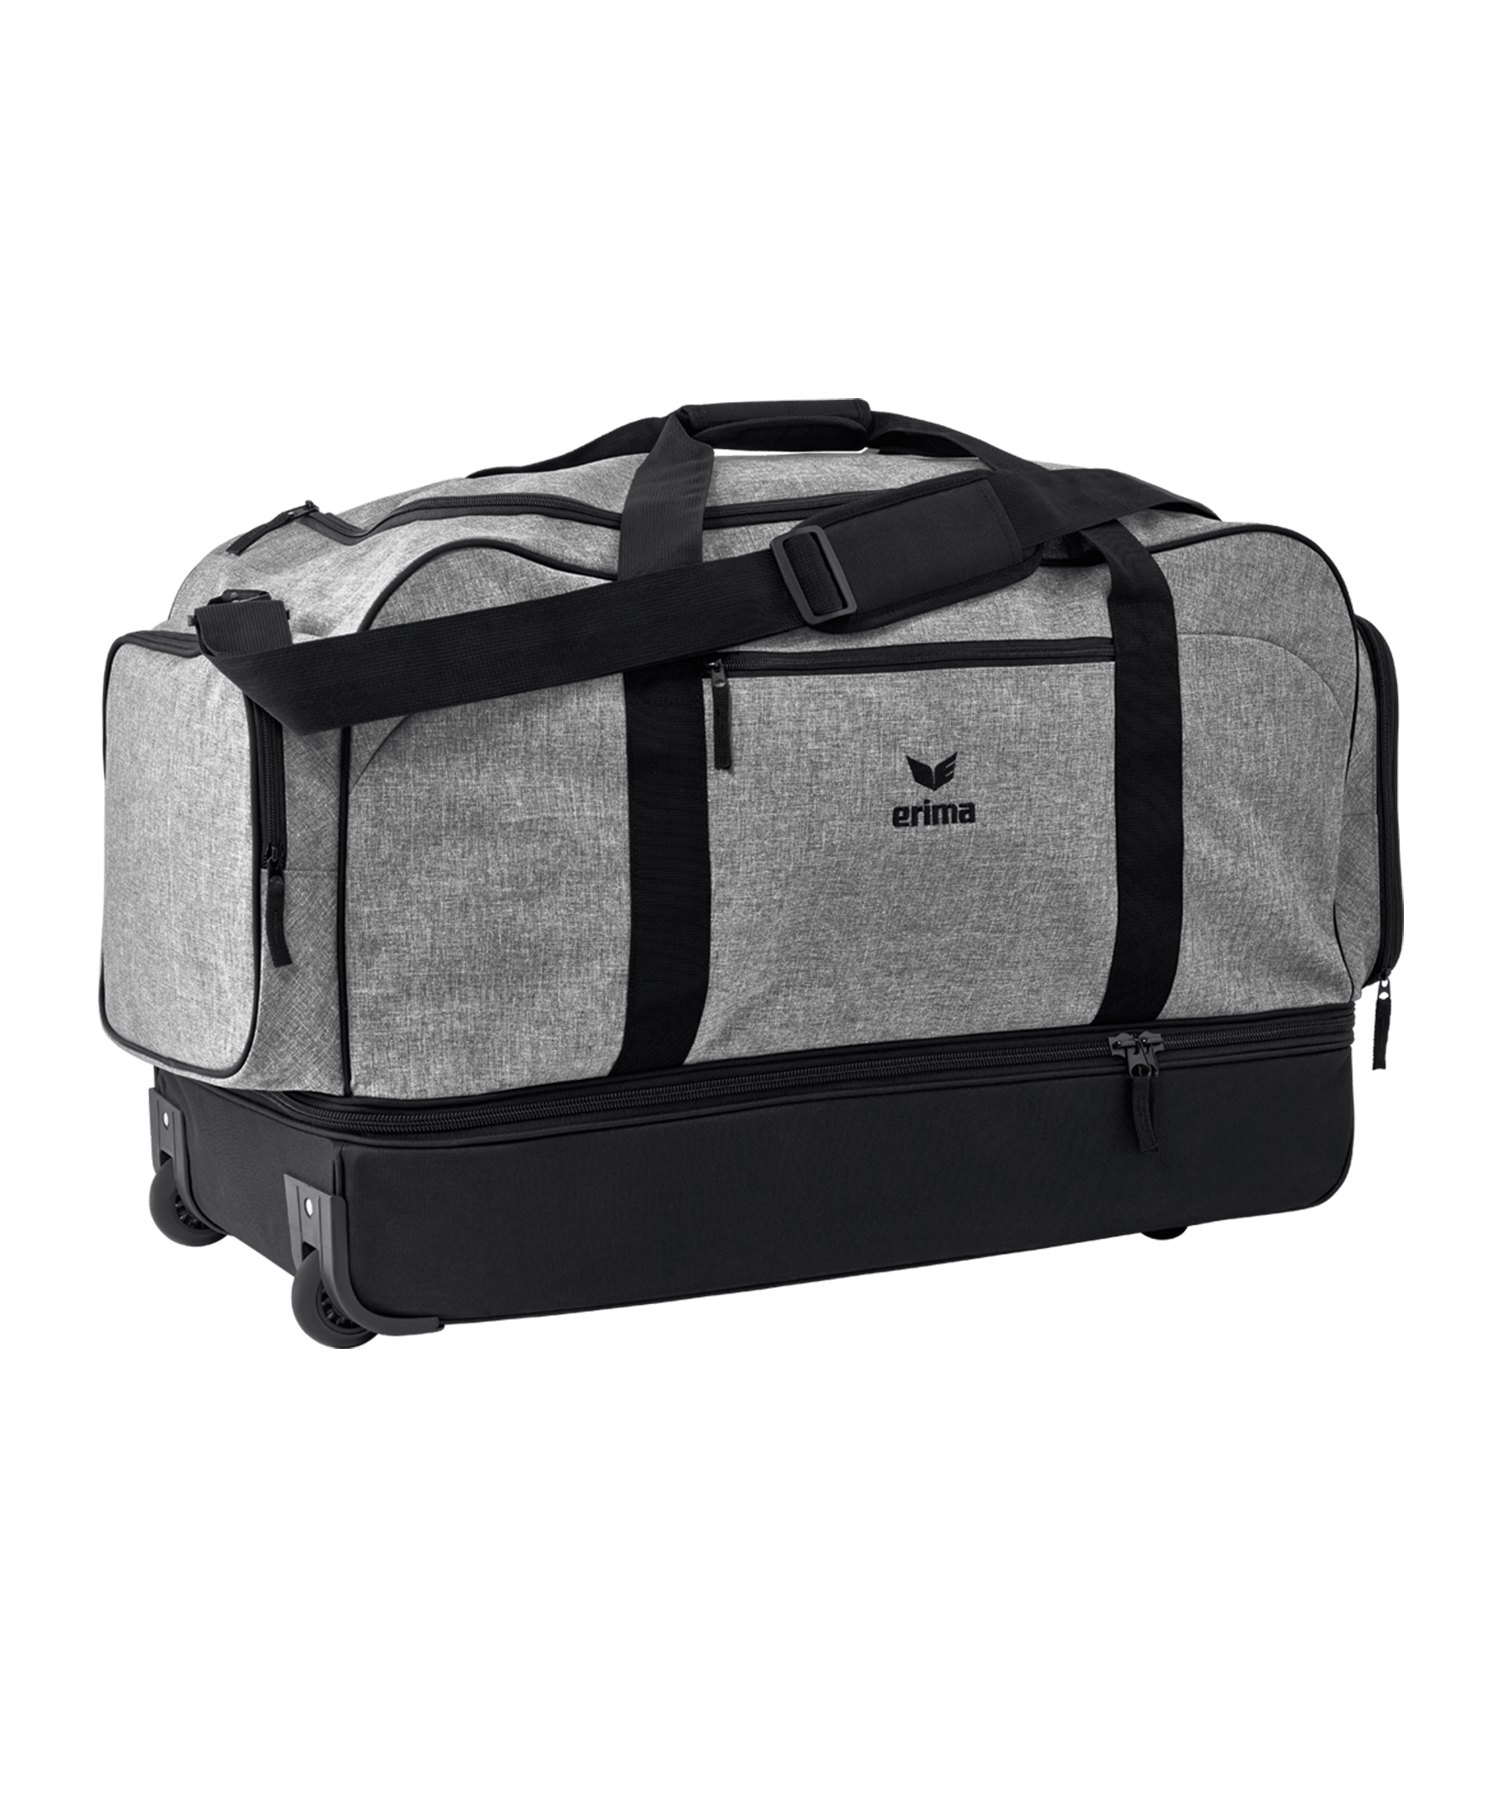 Erima Sportsbag Sporttasche Größe XL Grau Schwarz - grau